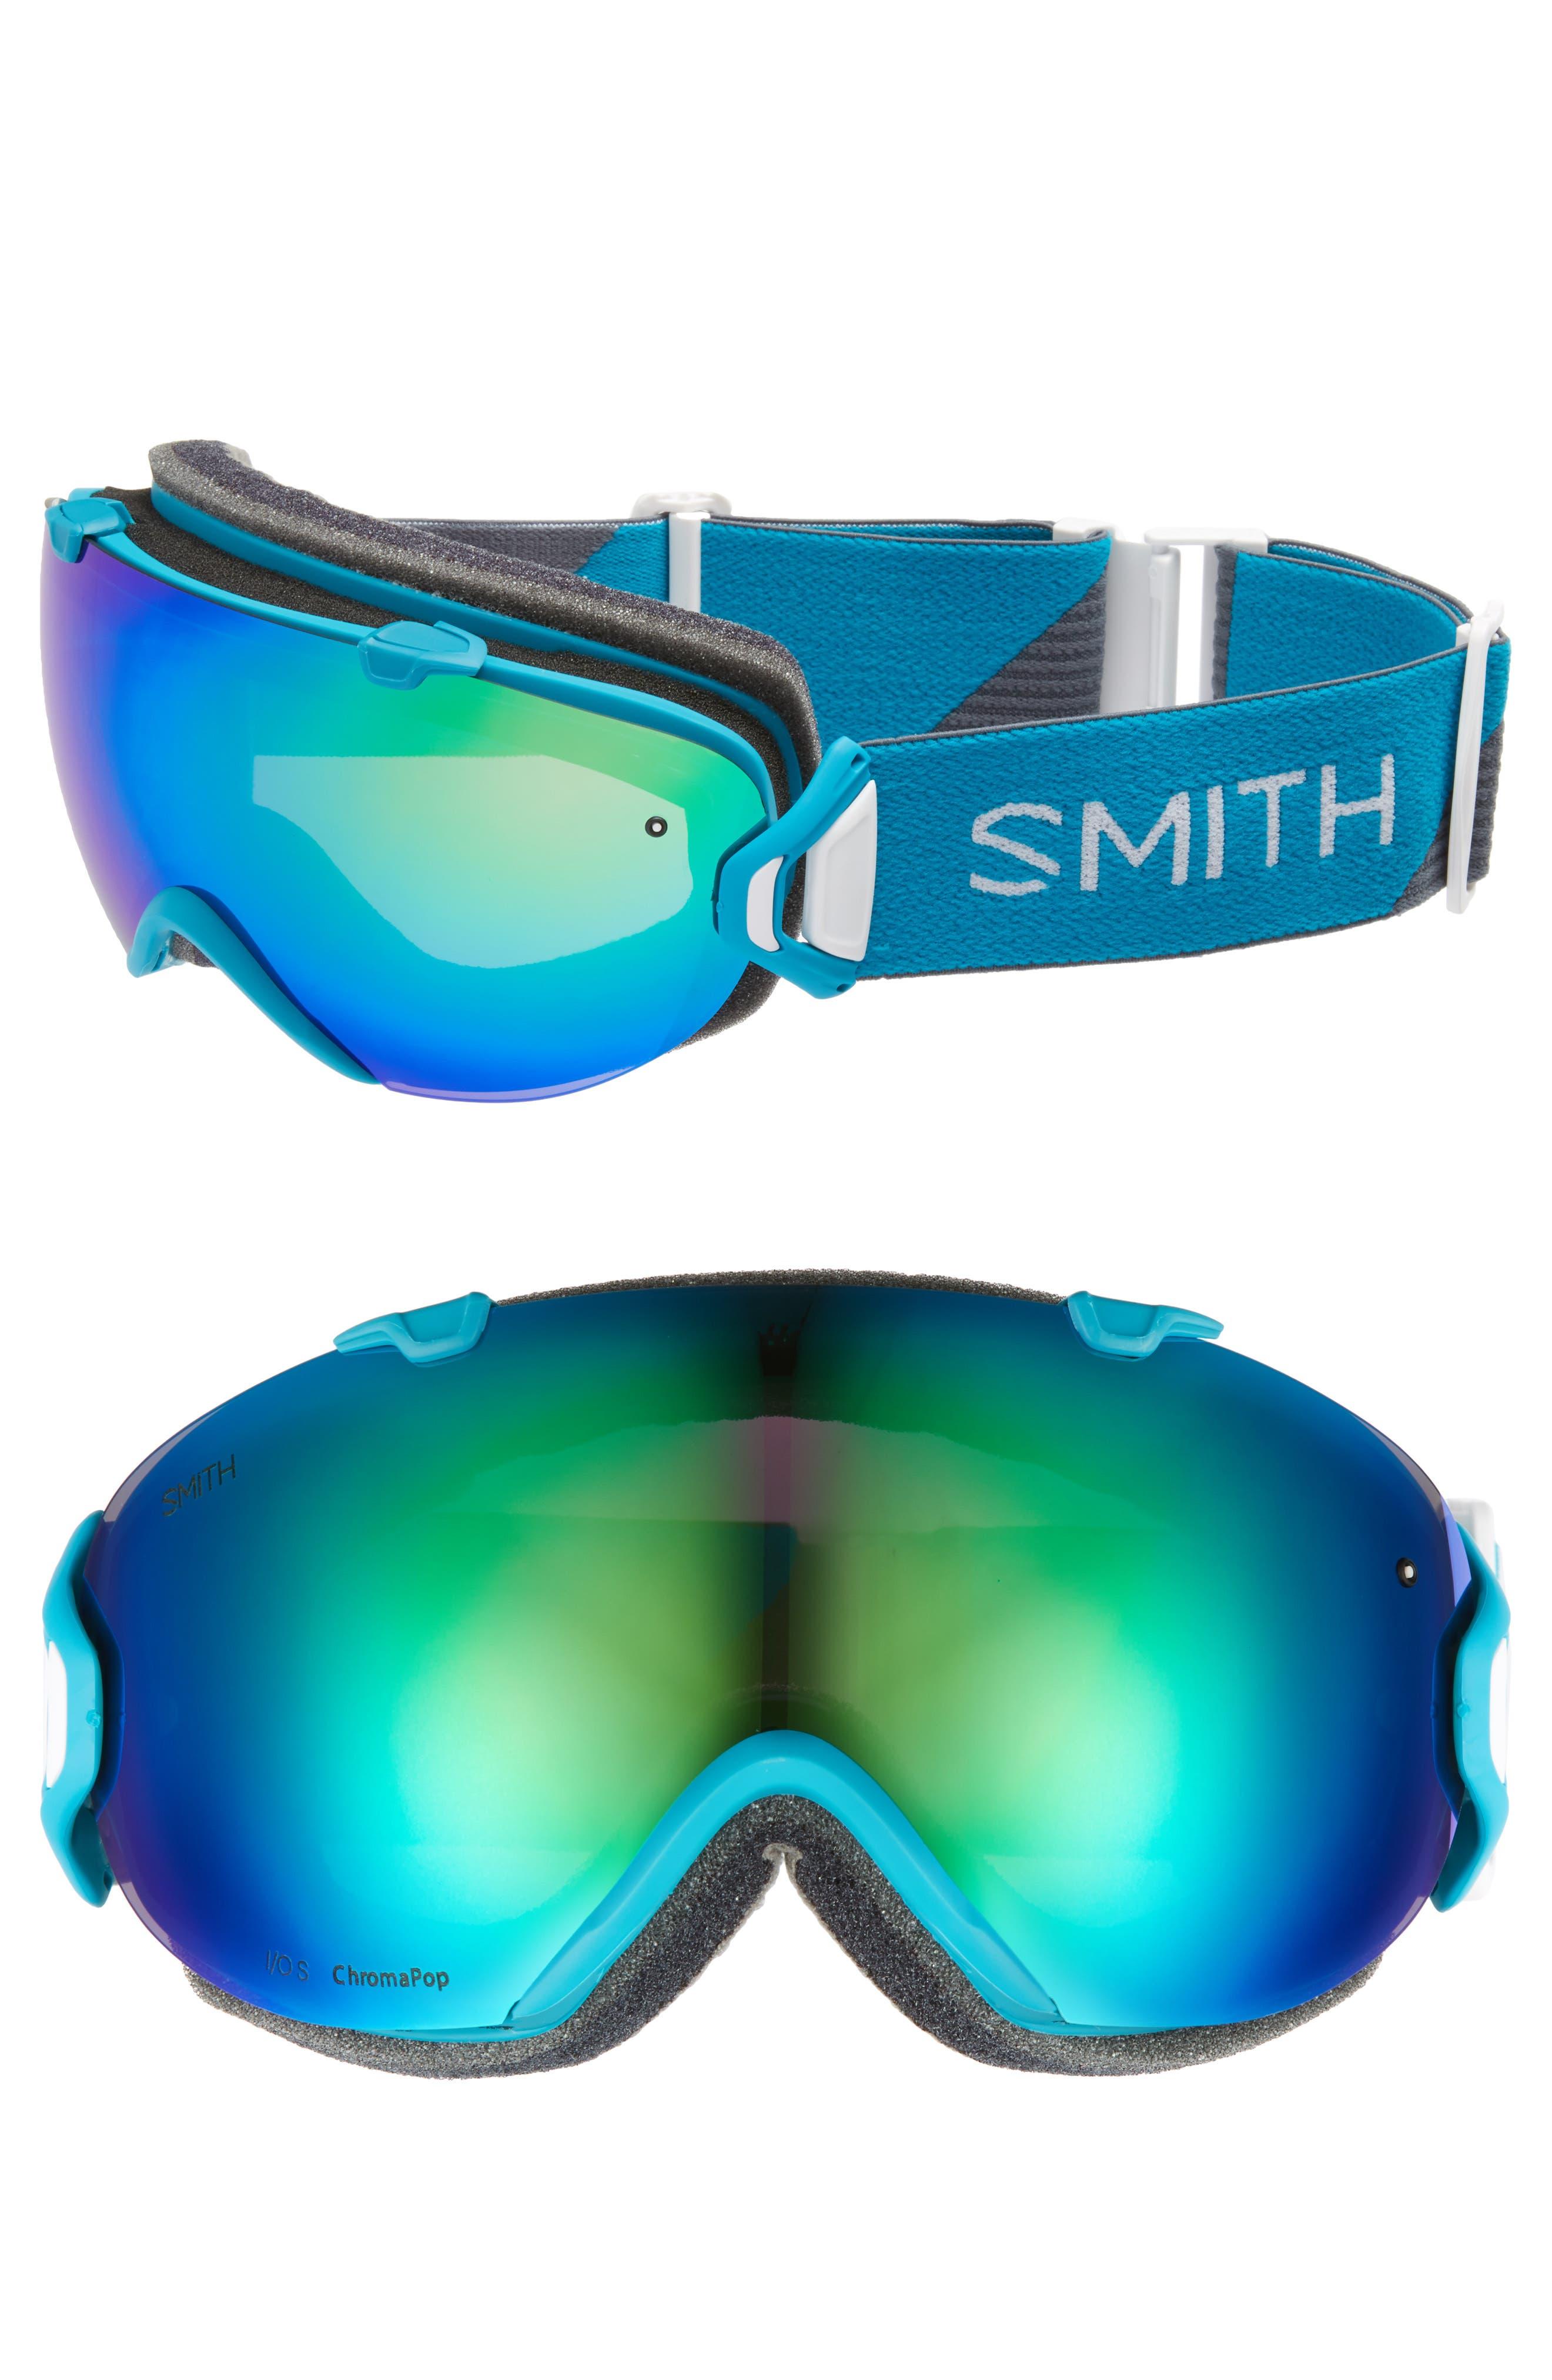 Alternate Image 1 Selected - Smith I/OS ChromaPop Snow Goggles